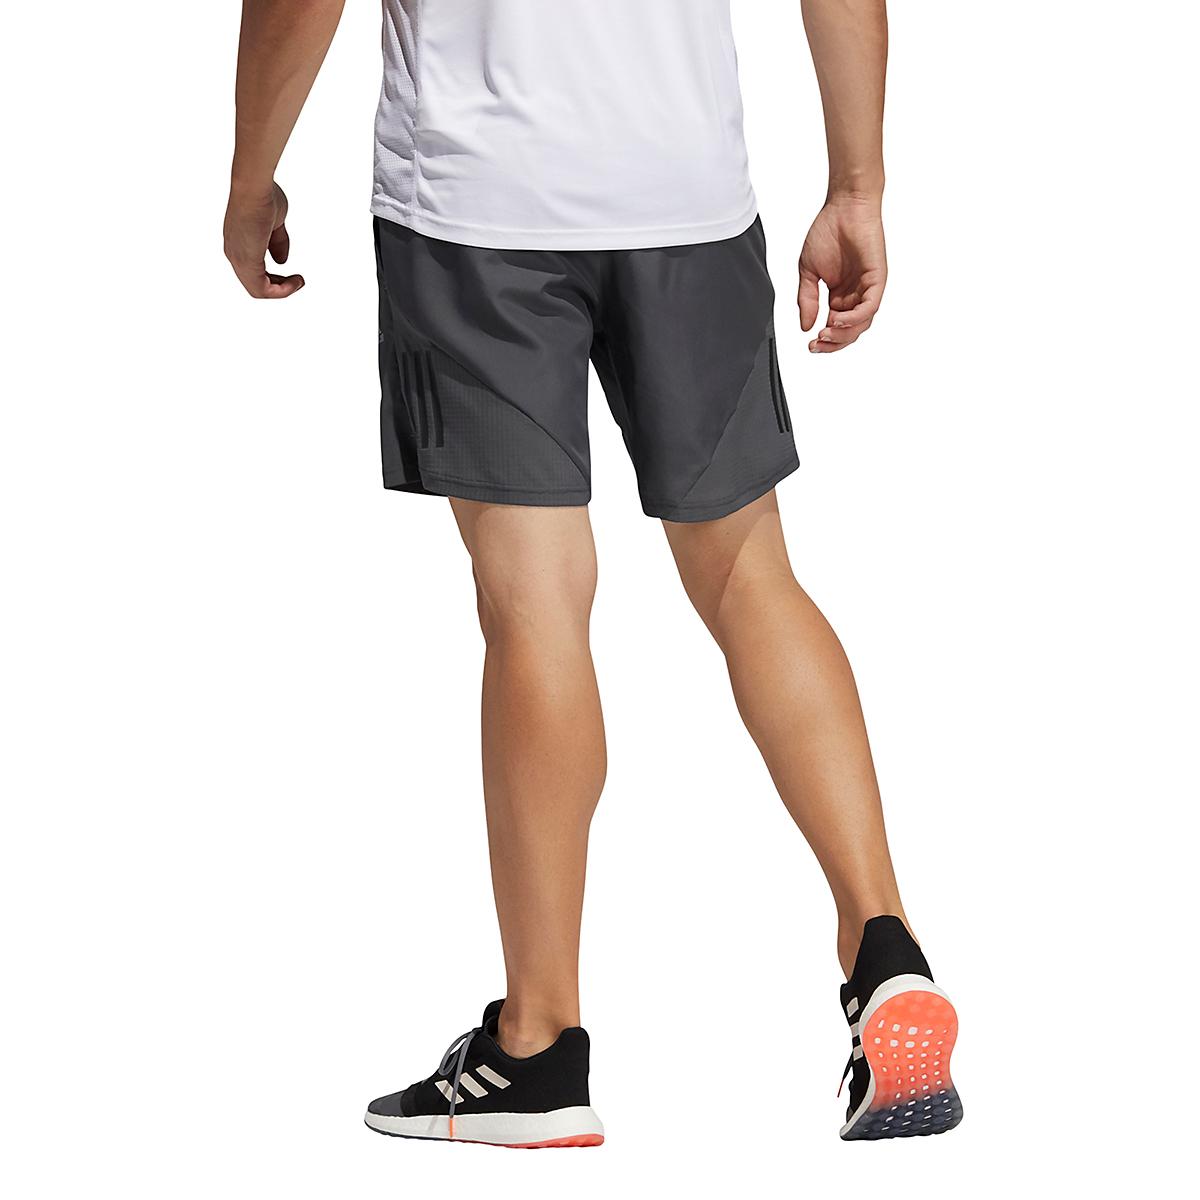 Men's Adidas Own The Run Shorts, , large, image 2